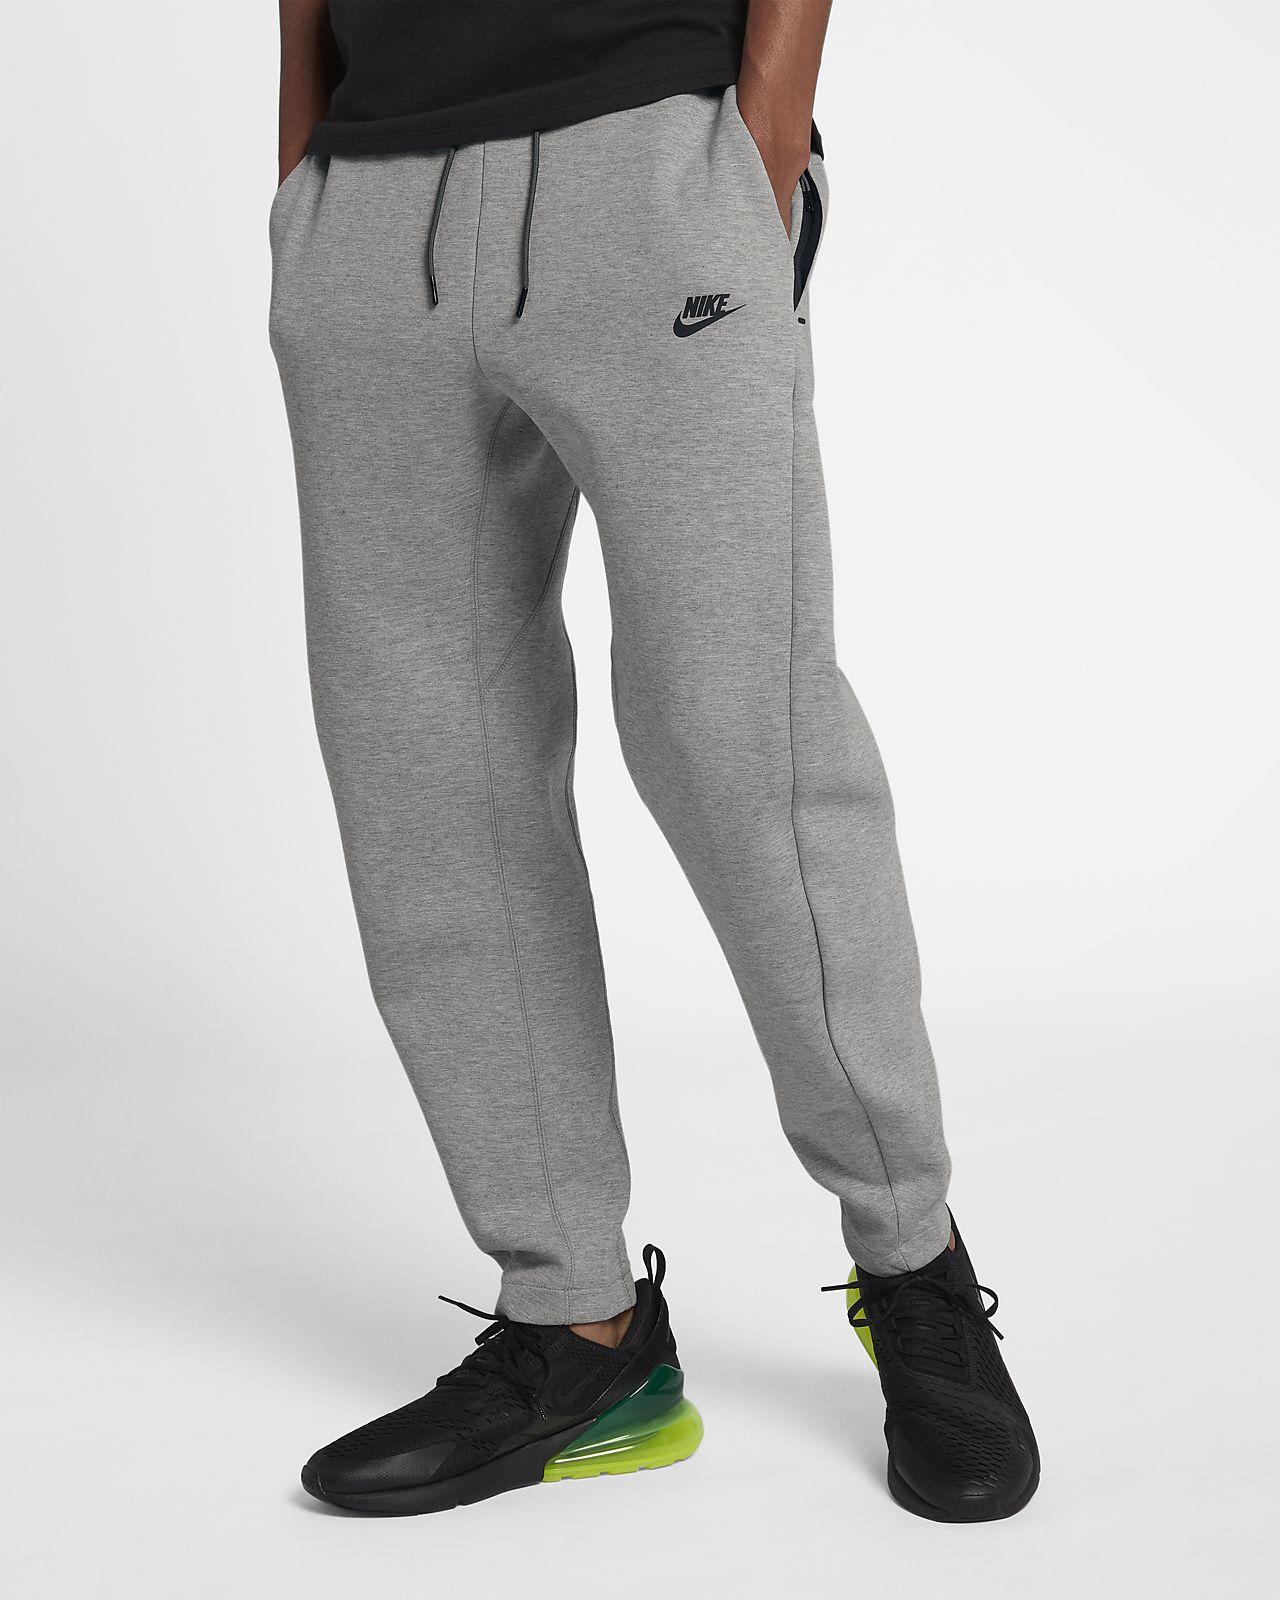 Nike Tech Fleece Top And Bottom Shop Clothing Shoes Online